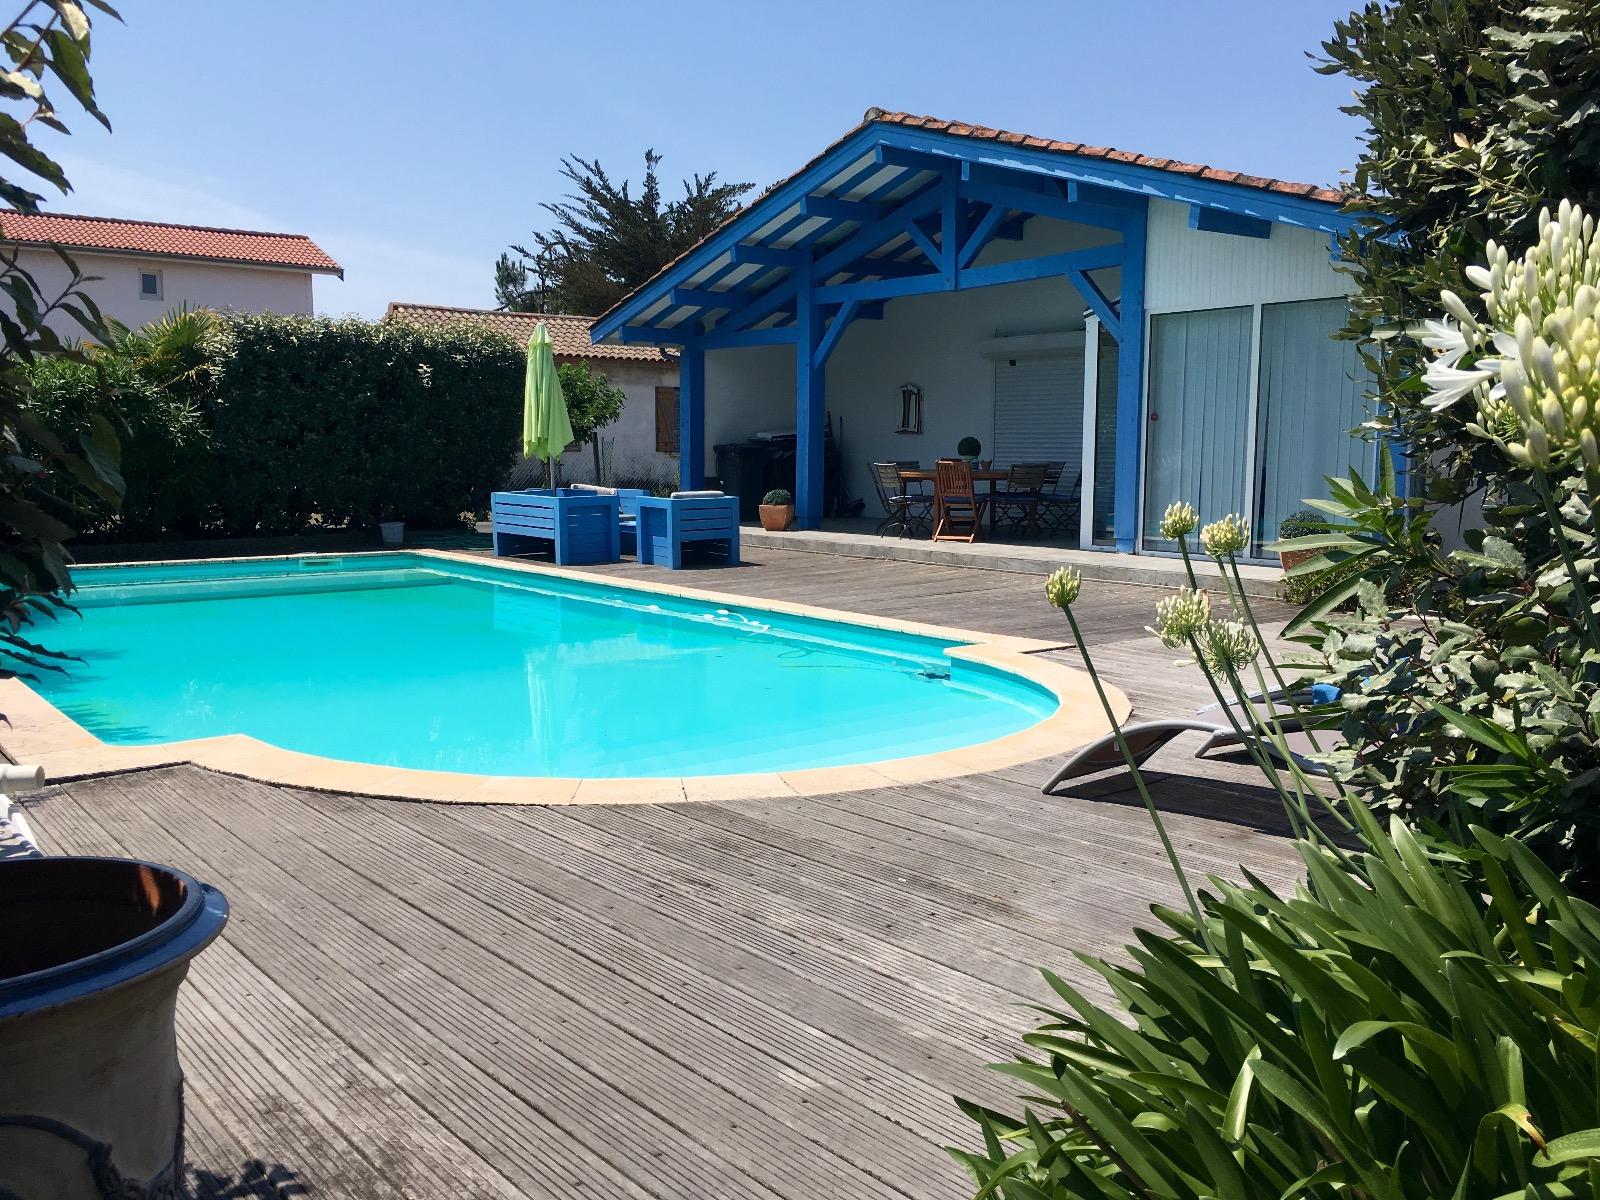 Mimizan plage villa f6 piscine idalement situe 100m des for Piscine mimizan